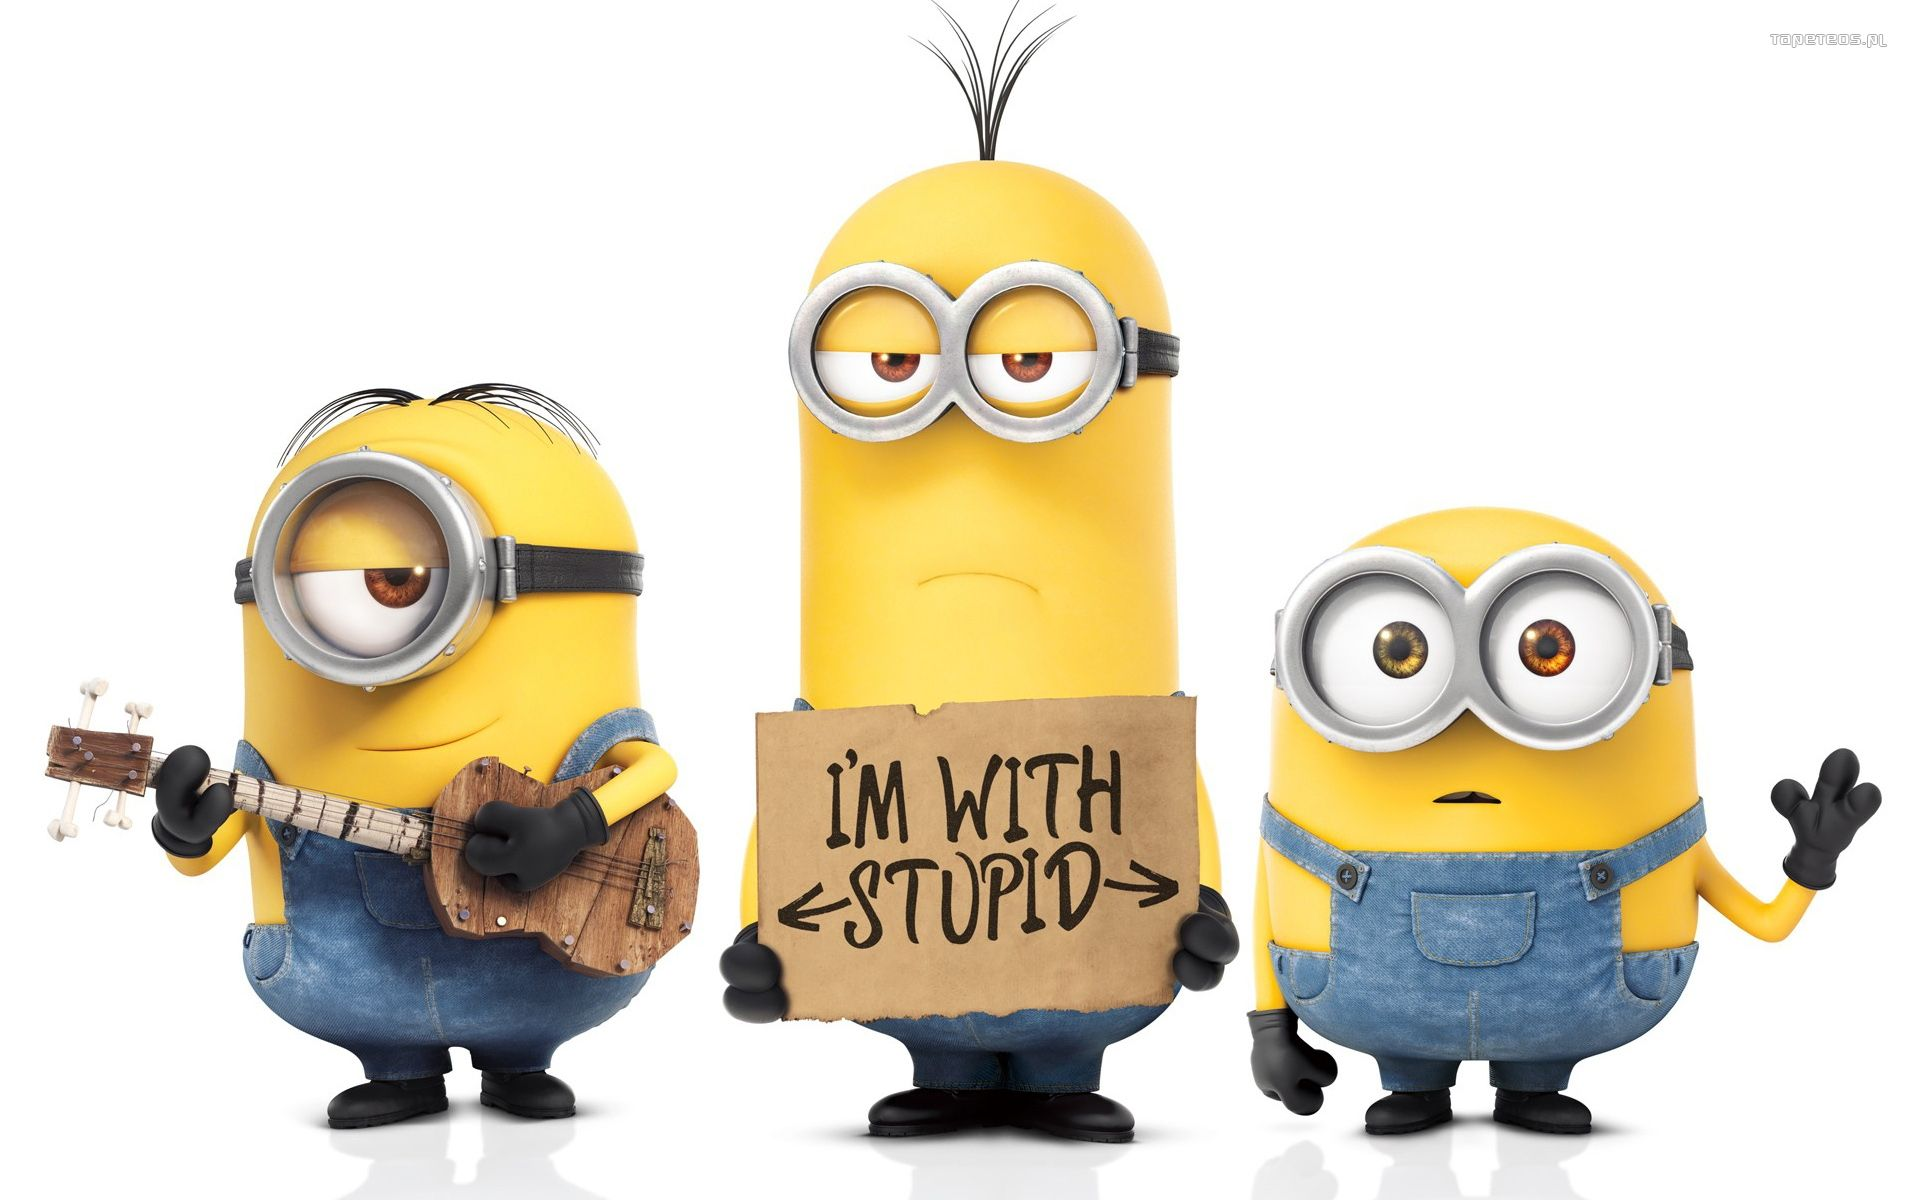 Minionki 2015 Minions 003 Stuart Kevin Bob Amor Minions Minion Humor Minion